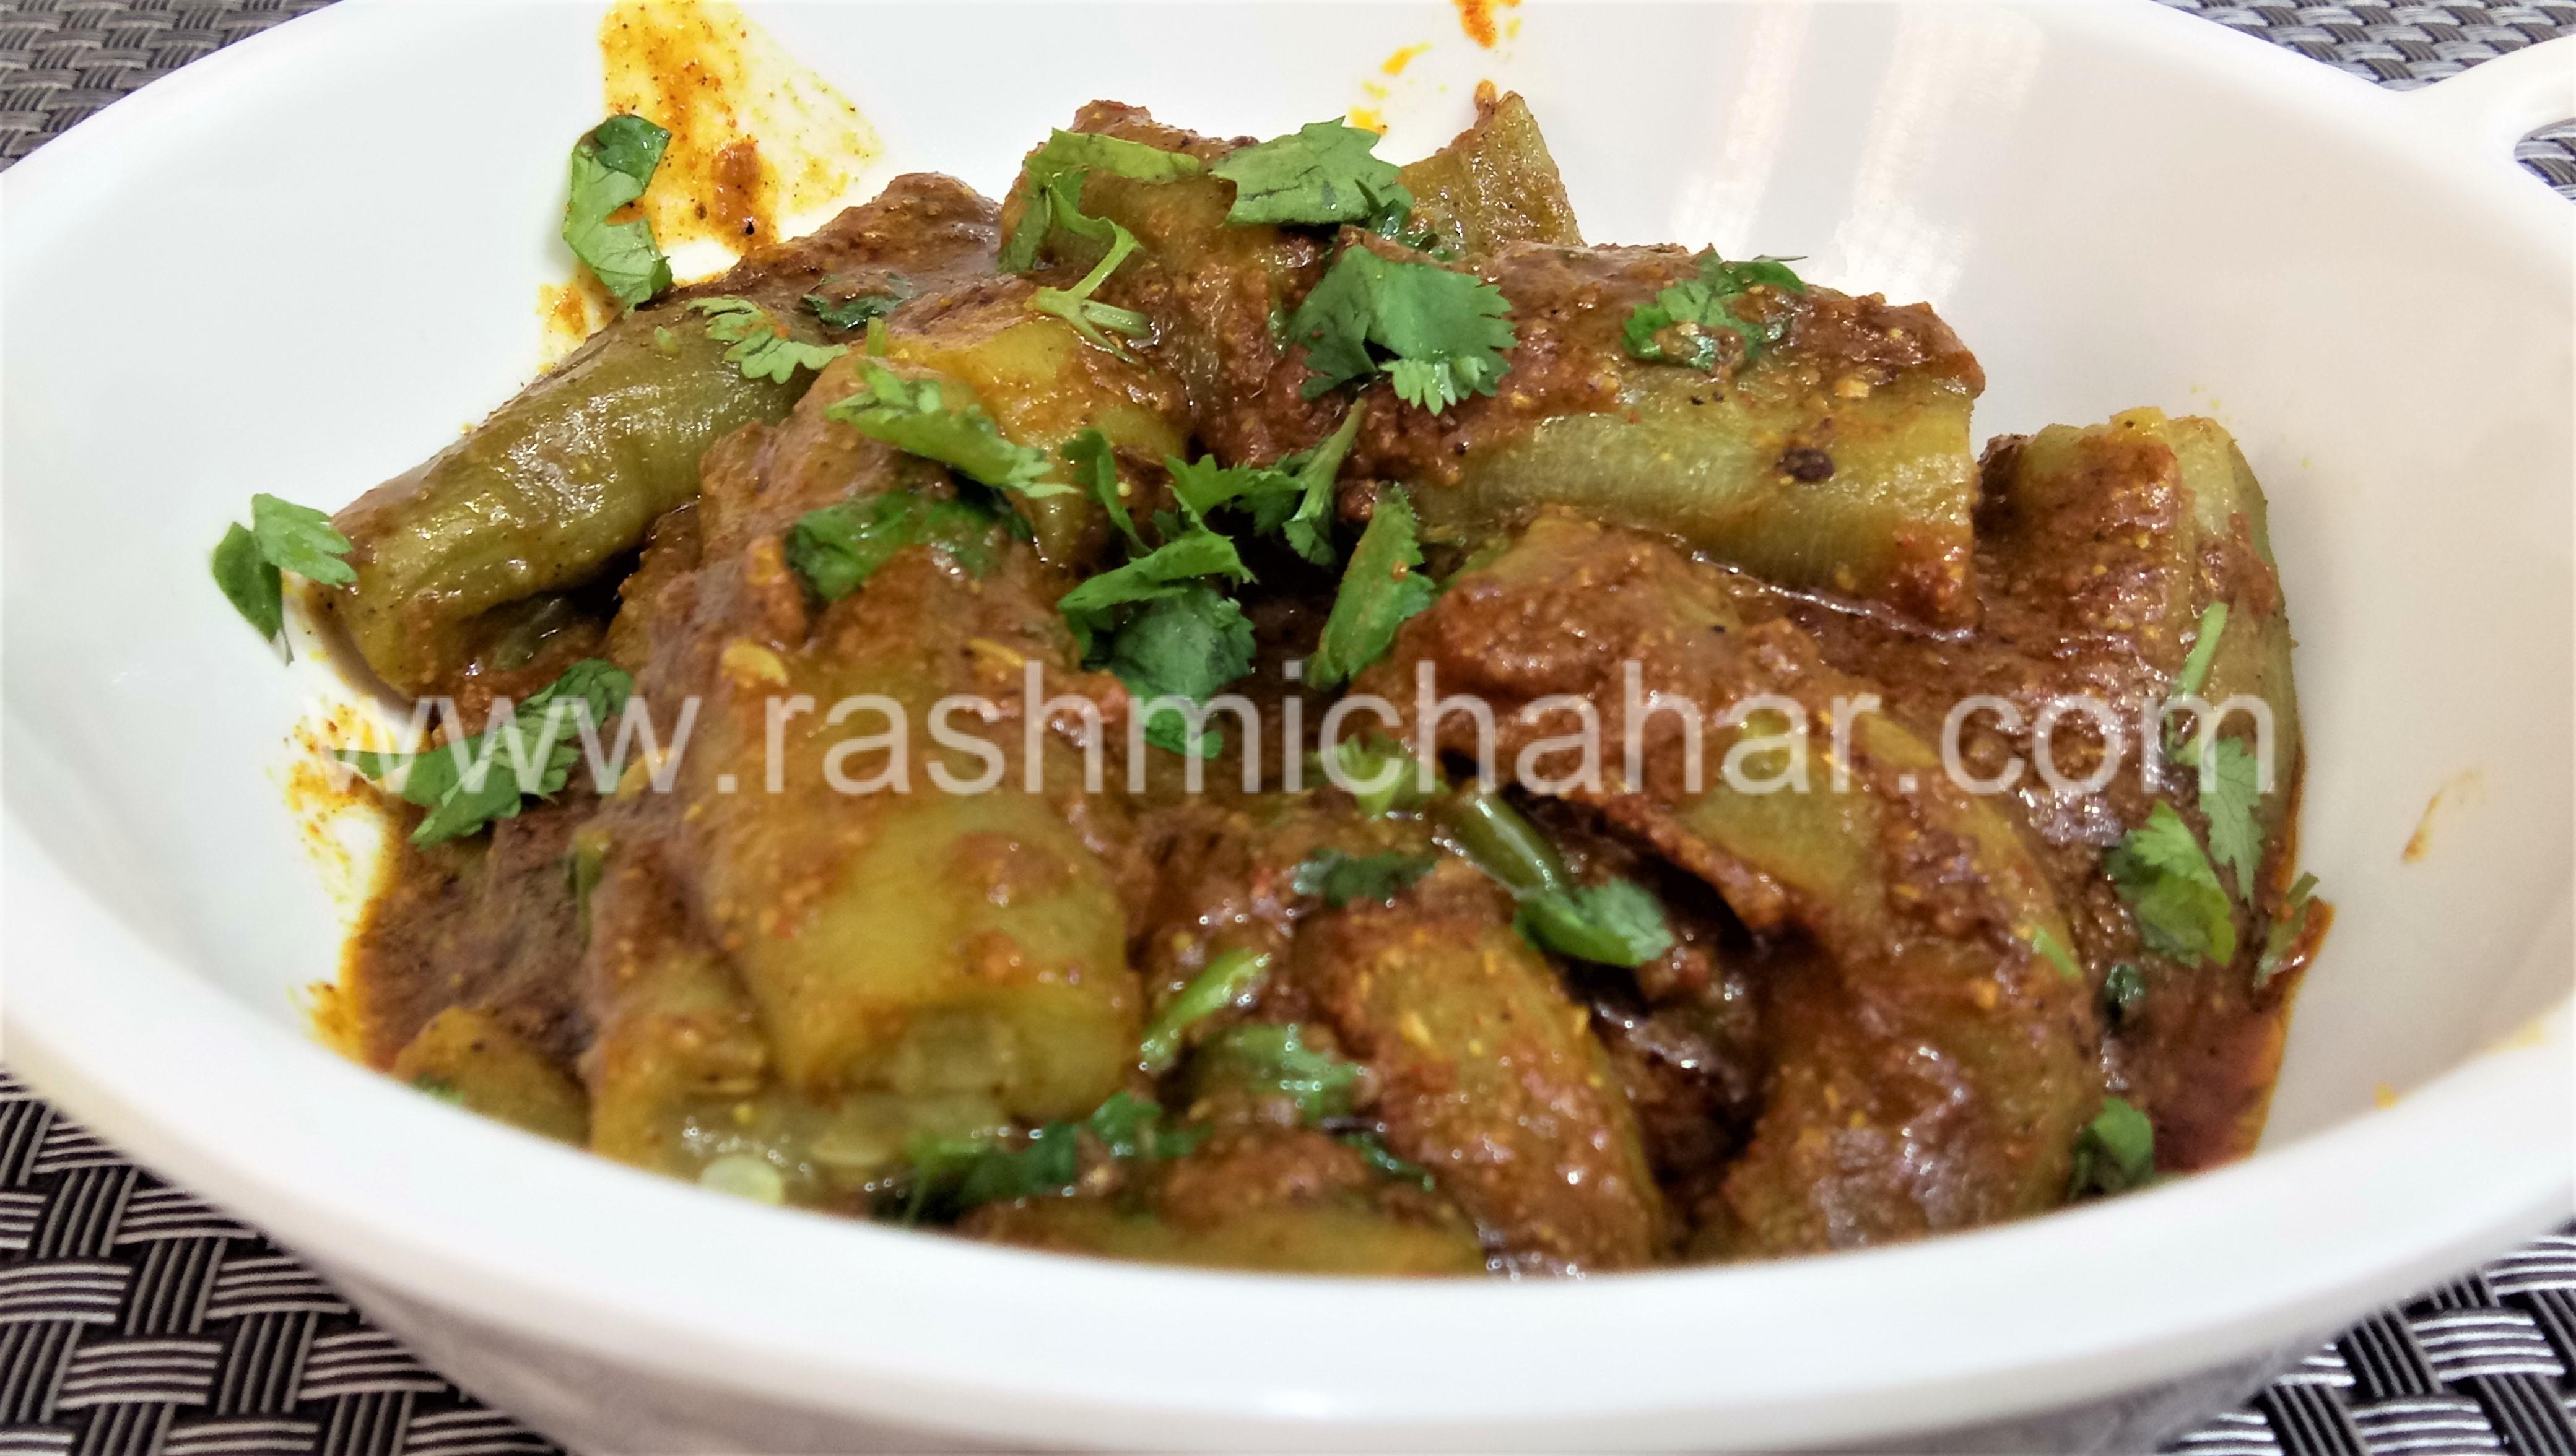 भरवां तोरई रेसिपी | Bharwan Turai Recipe | Stuffed Torai Recipe